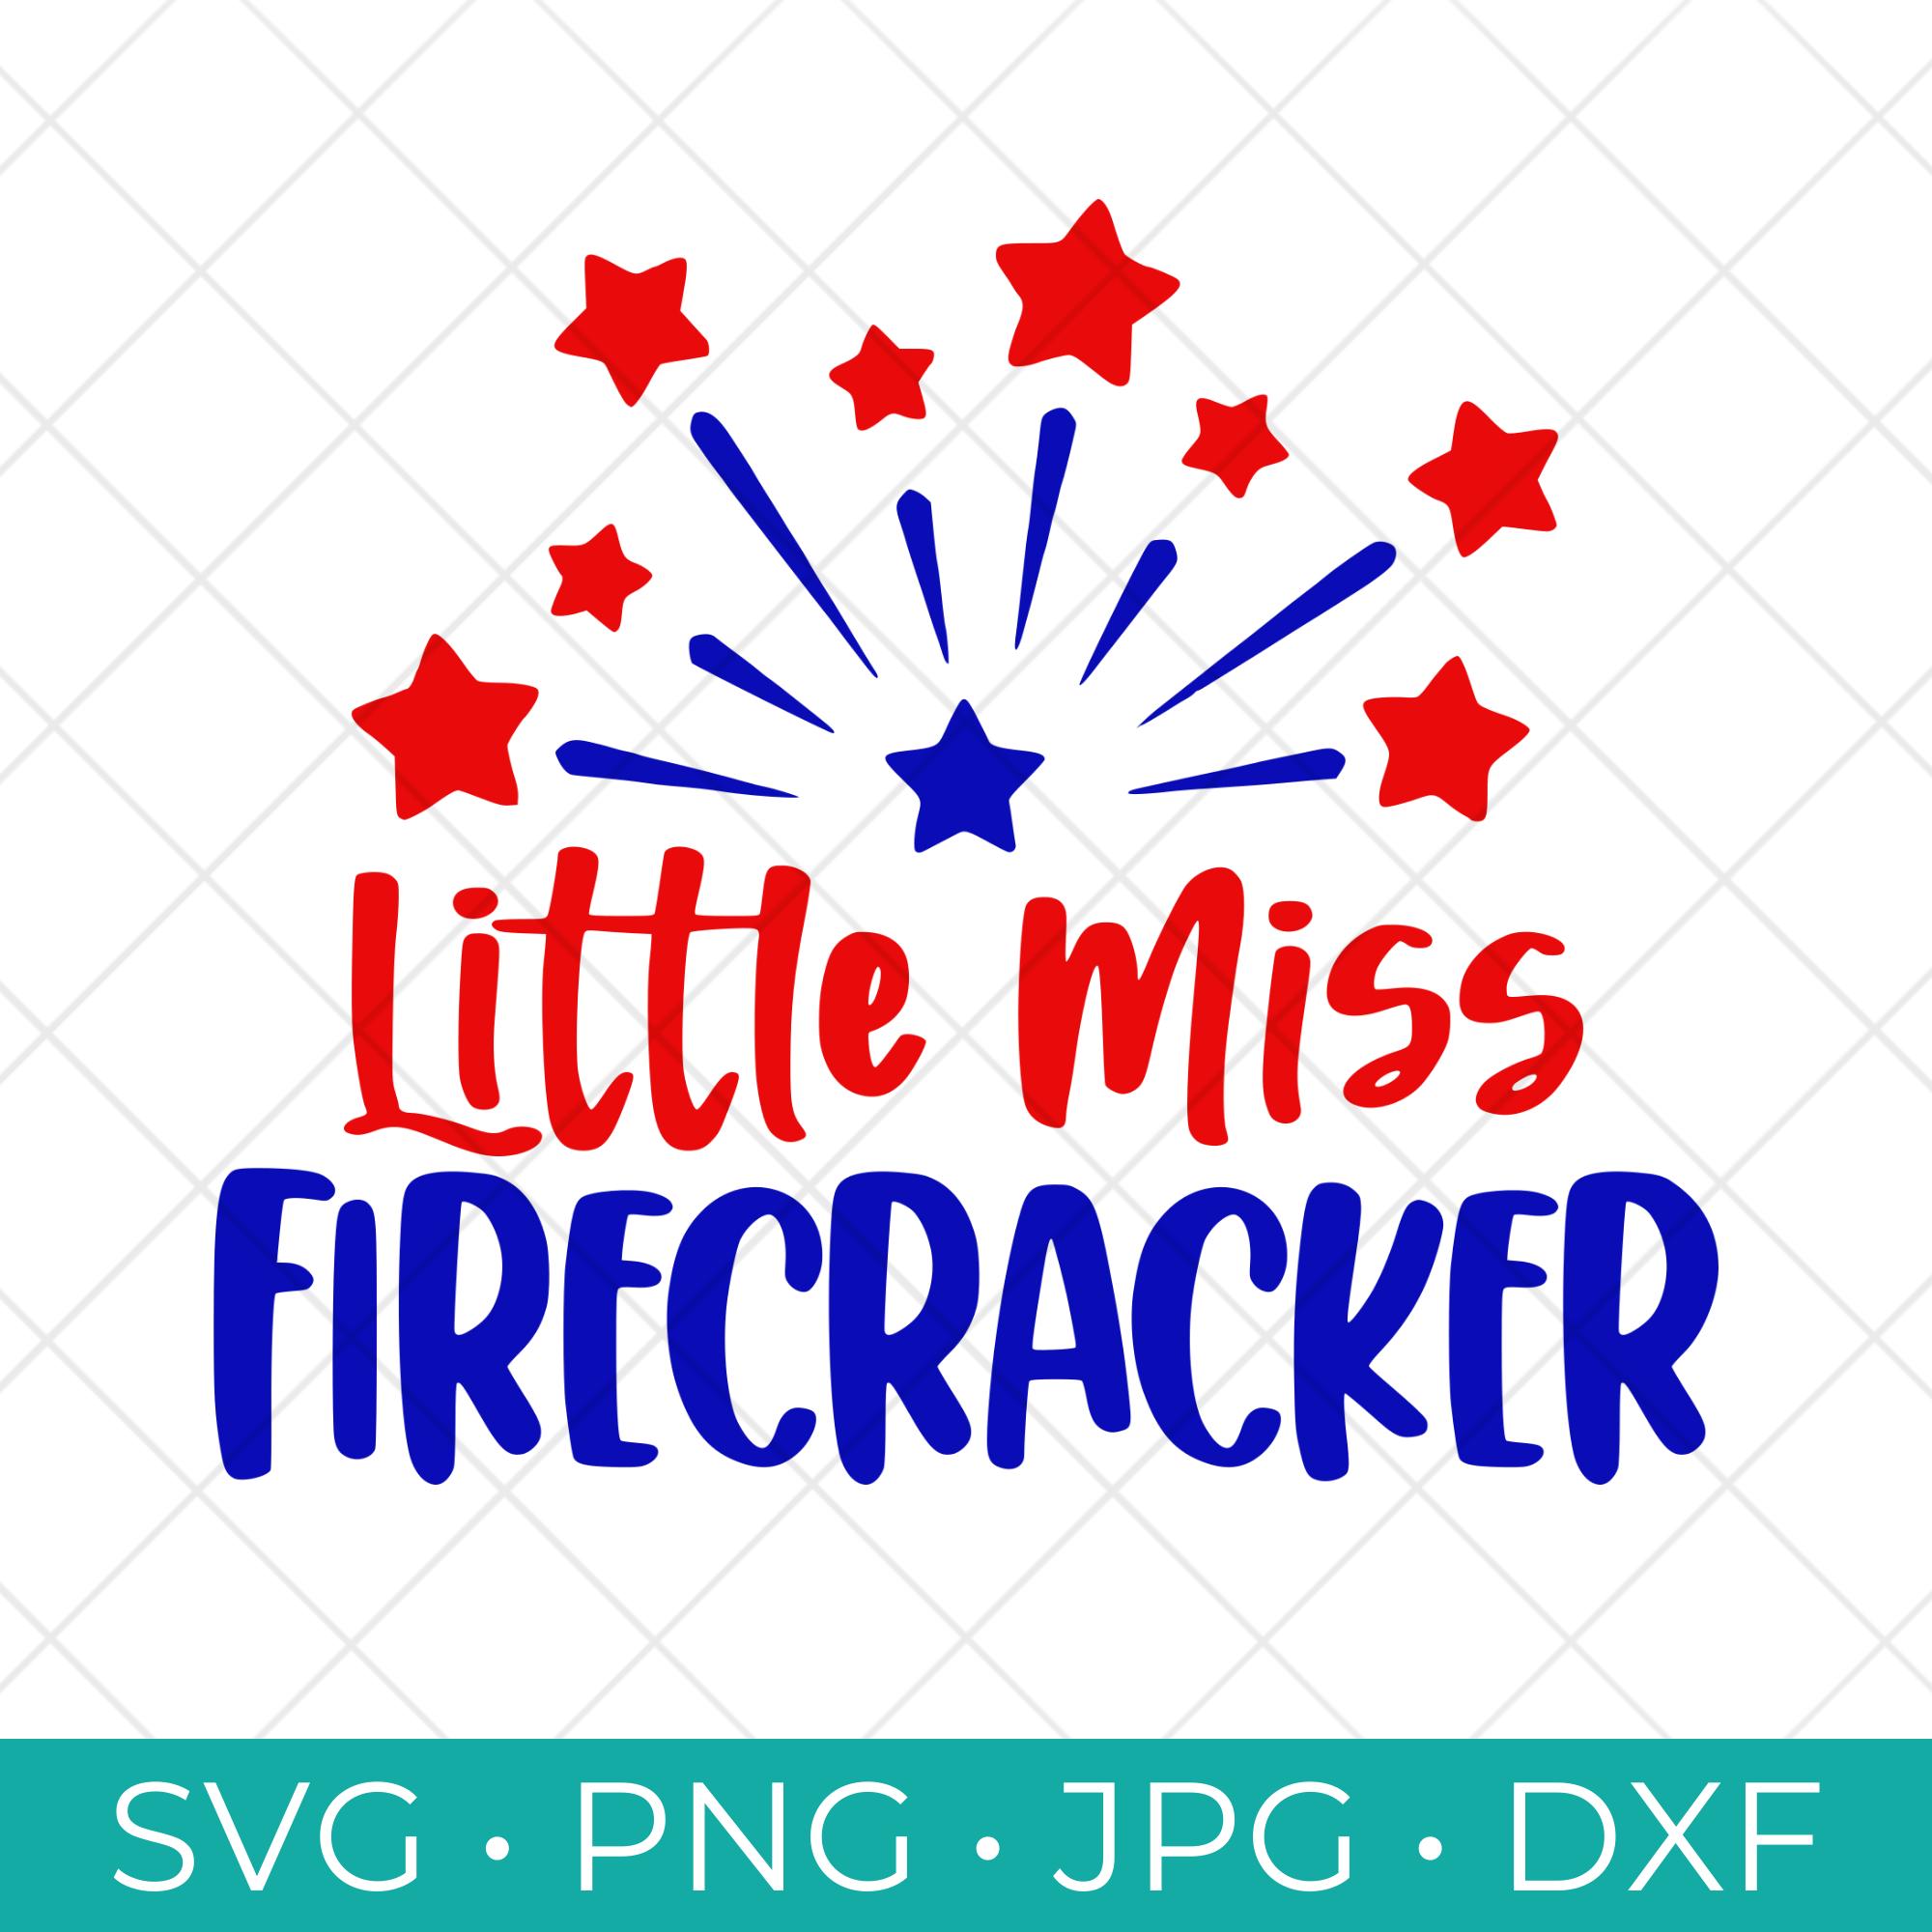 Little Miss Firecracker SVG Cut File Free Download